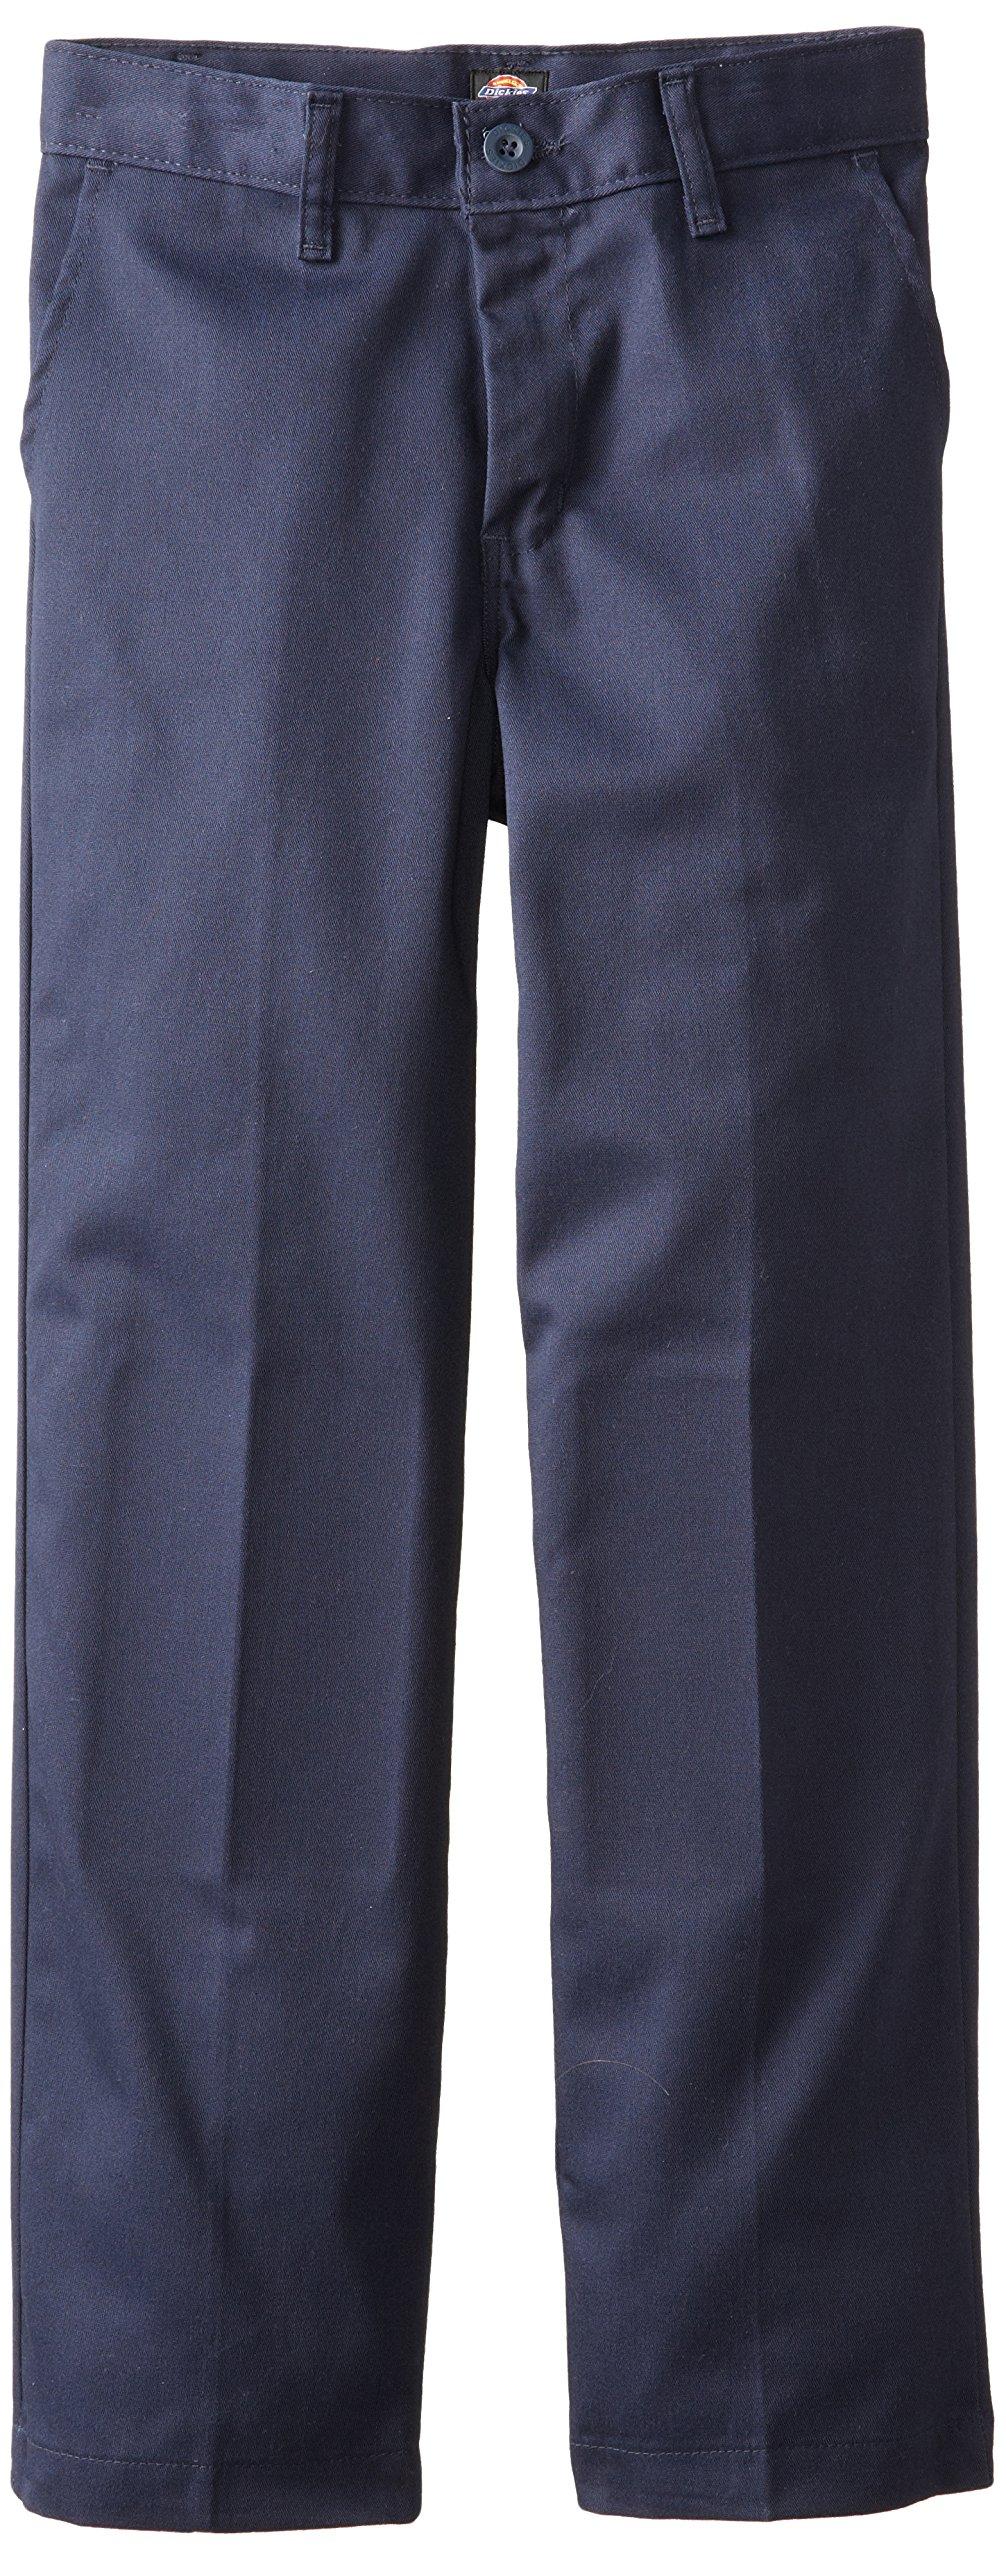 Dickies Khaki Big Boys' Flex Waist Stretch Pant, Dark Navy, 8 Regular